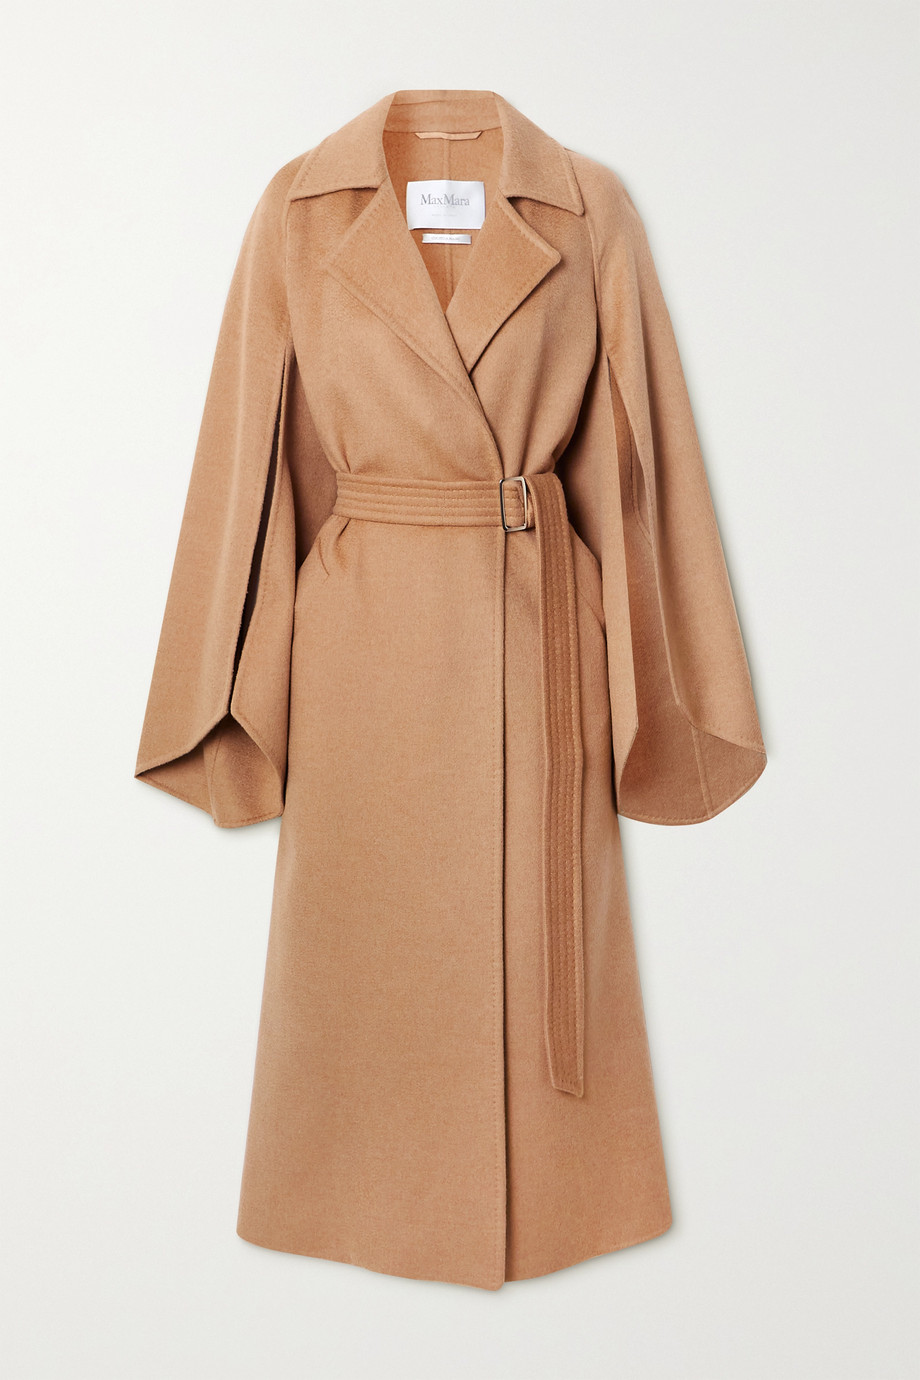 Max Mara Milano belted camel hair coat